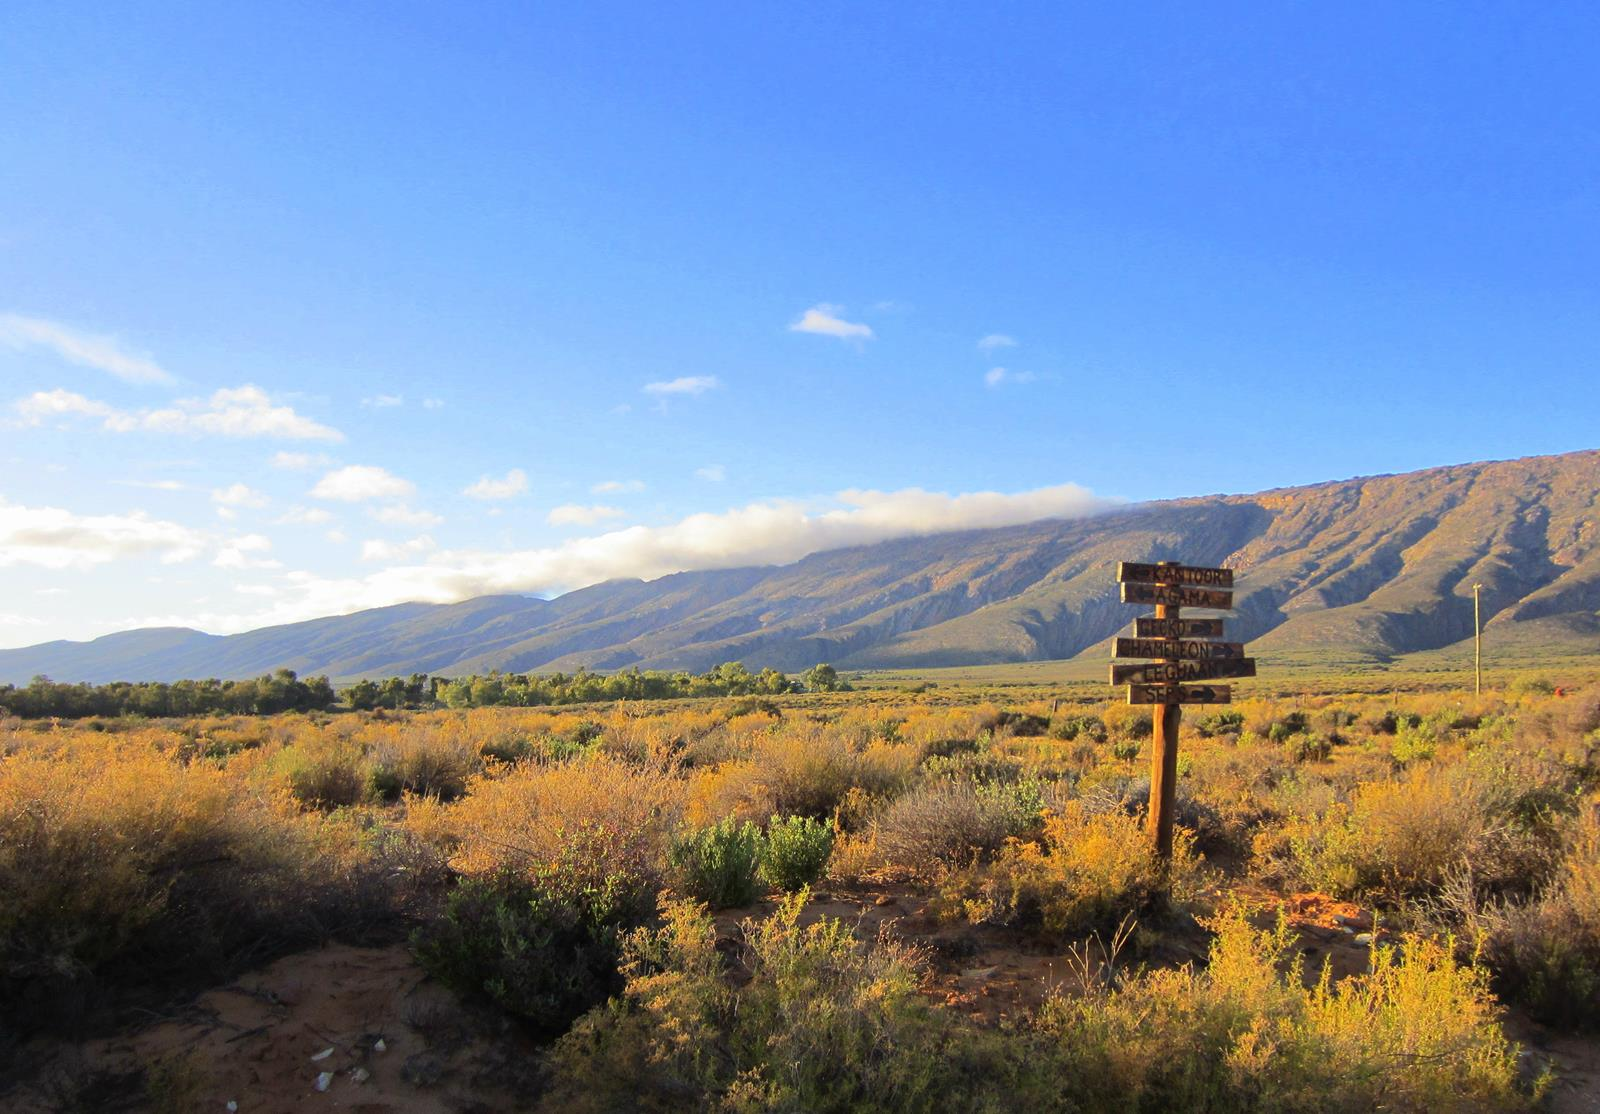 Mountain fynbos mixed with semi-arid Karoo veld.